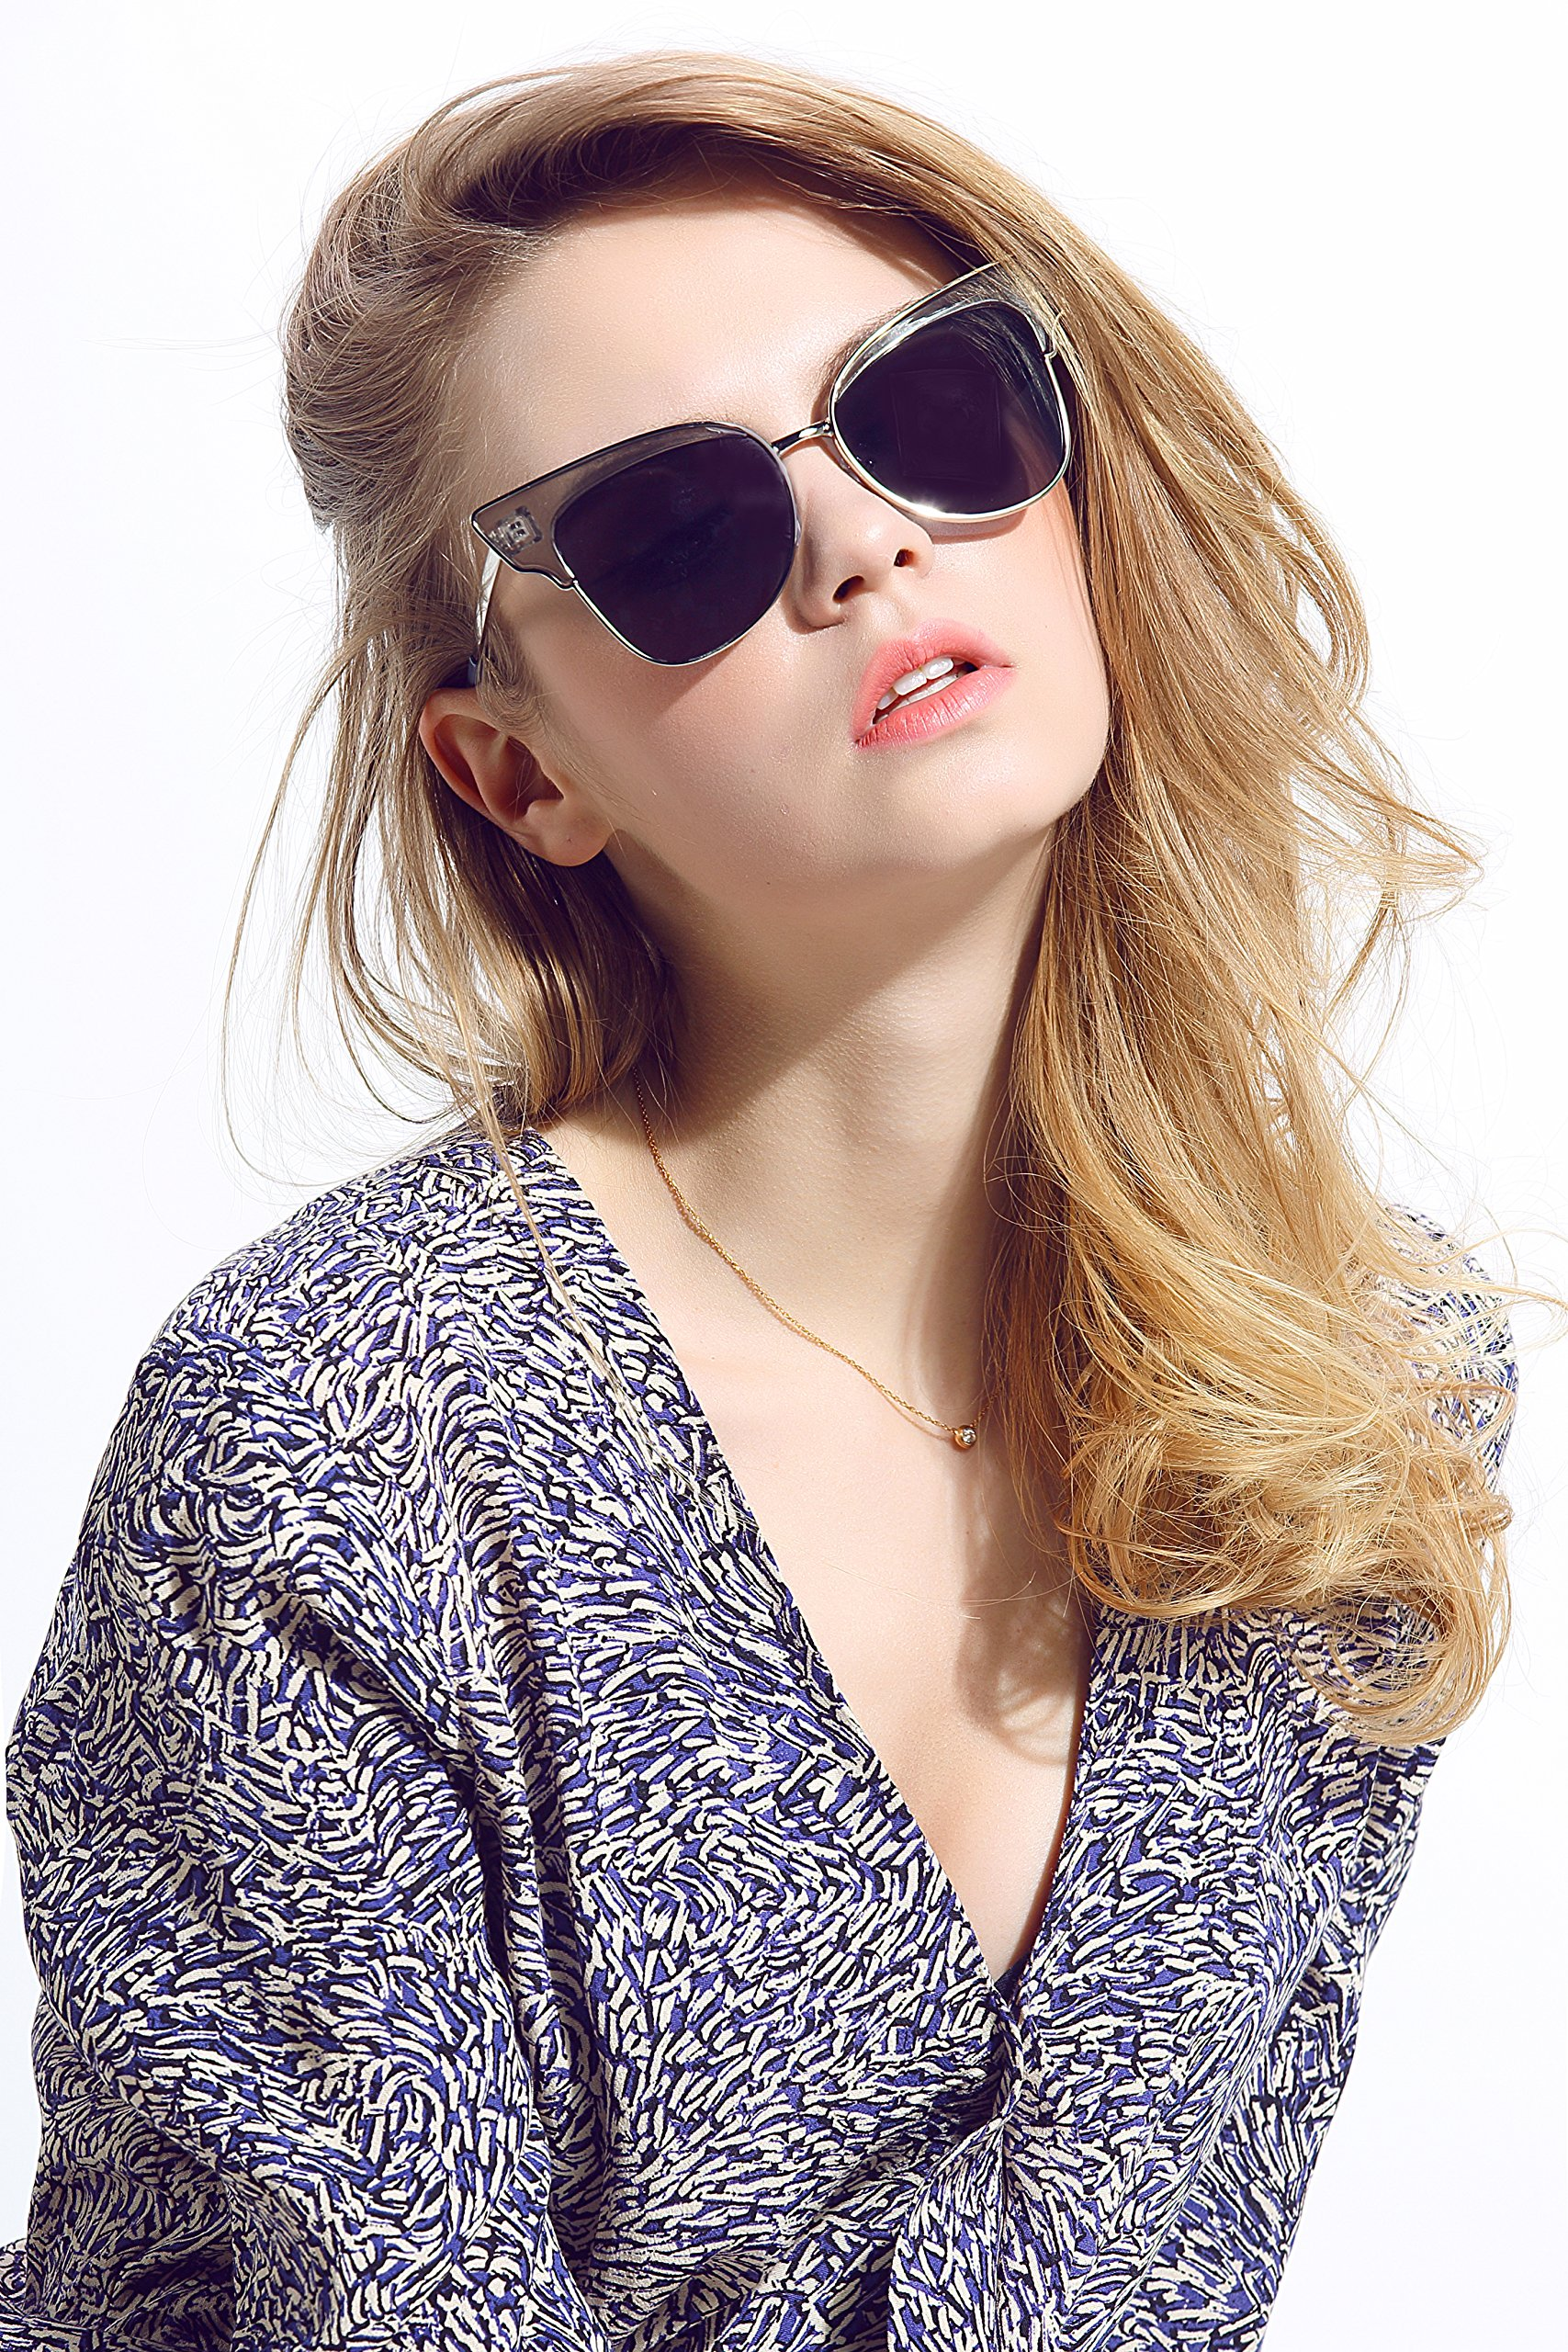 Diamond Candy Women's Fashion Sunglasses UV Protection Sexy Eyewear UV400 Goggles 5Gray